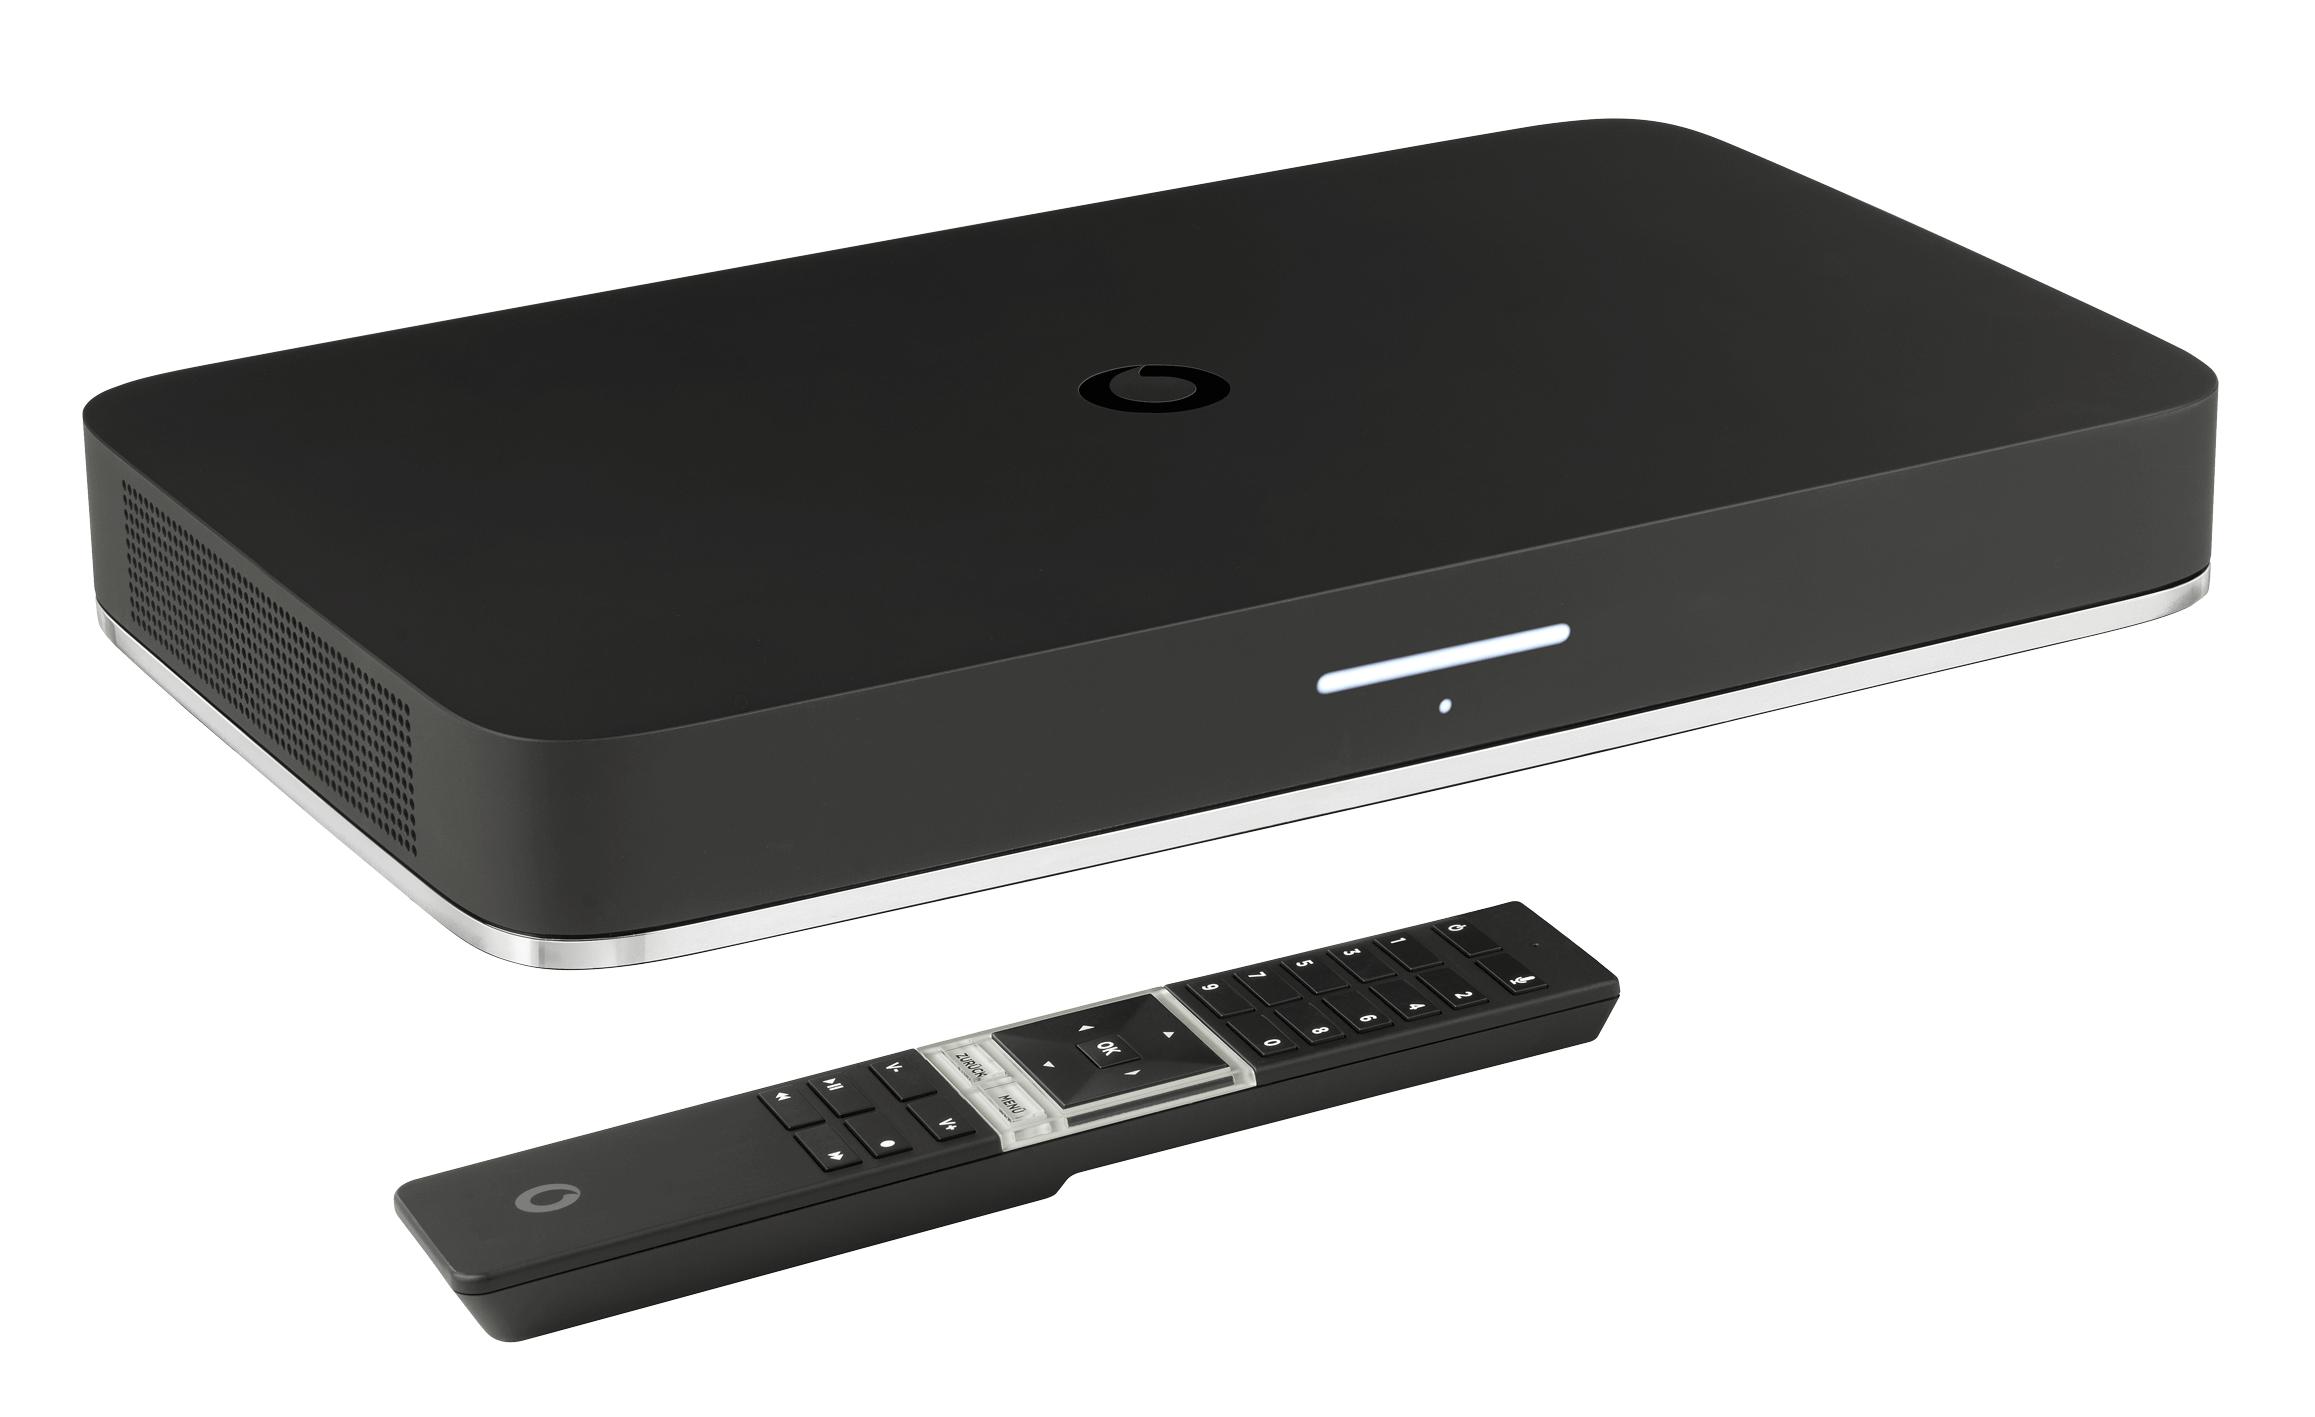 Vodafon Giga Tv